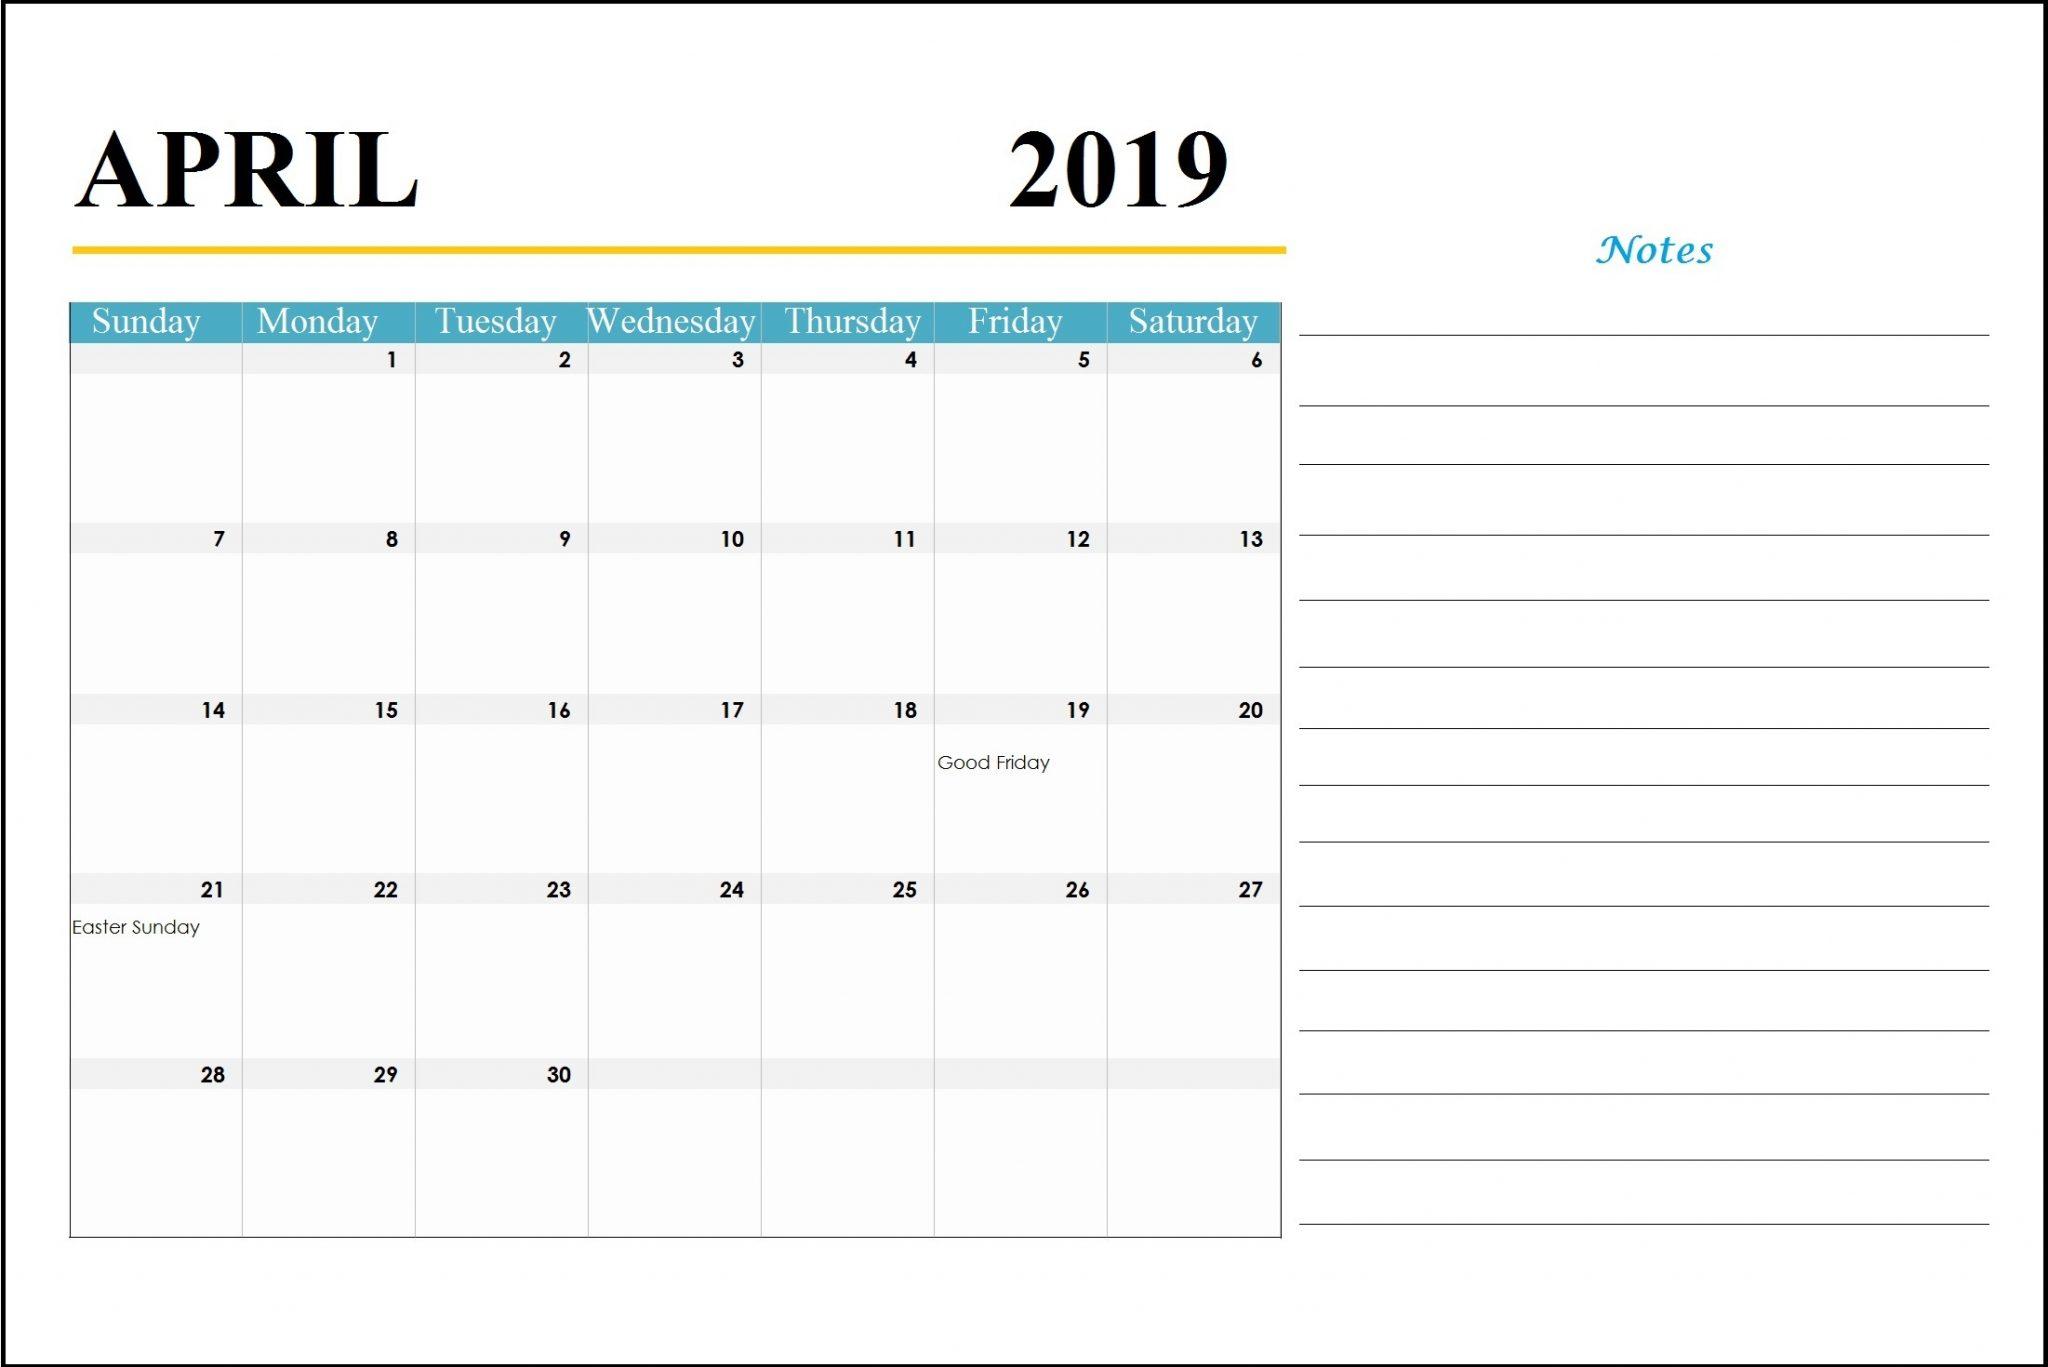 April 2019 Holidays Calendar With Notes - Printable Calendar 2019 throughout Blank Calendar Template With Notes